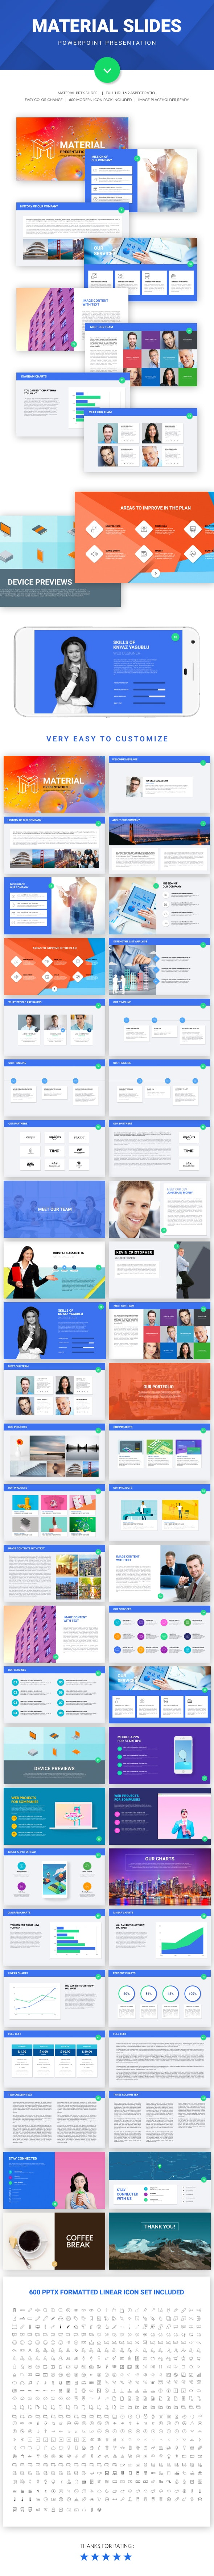 Material Slide Powerpoint Presentation Template - PowerPoint Templates Presentation Templates